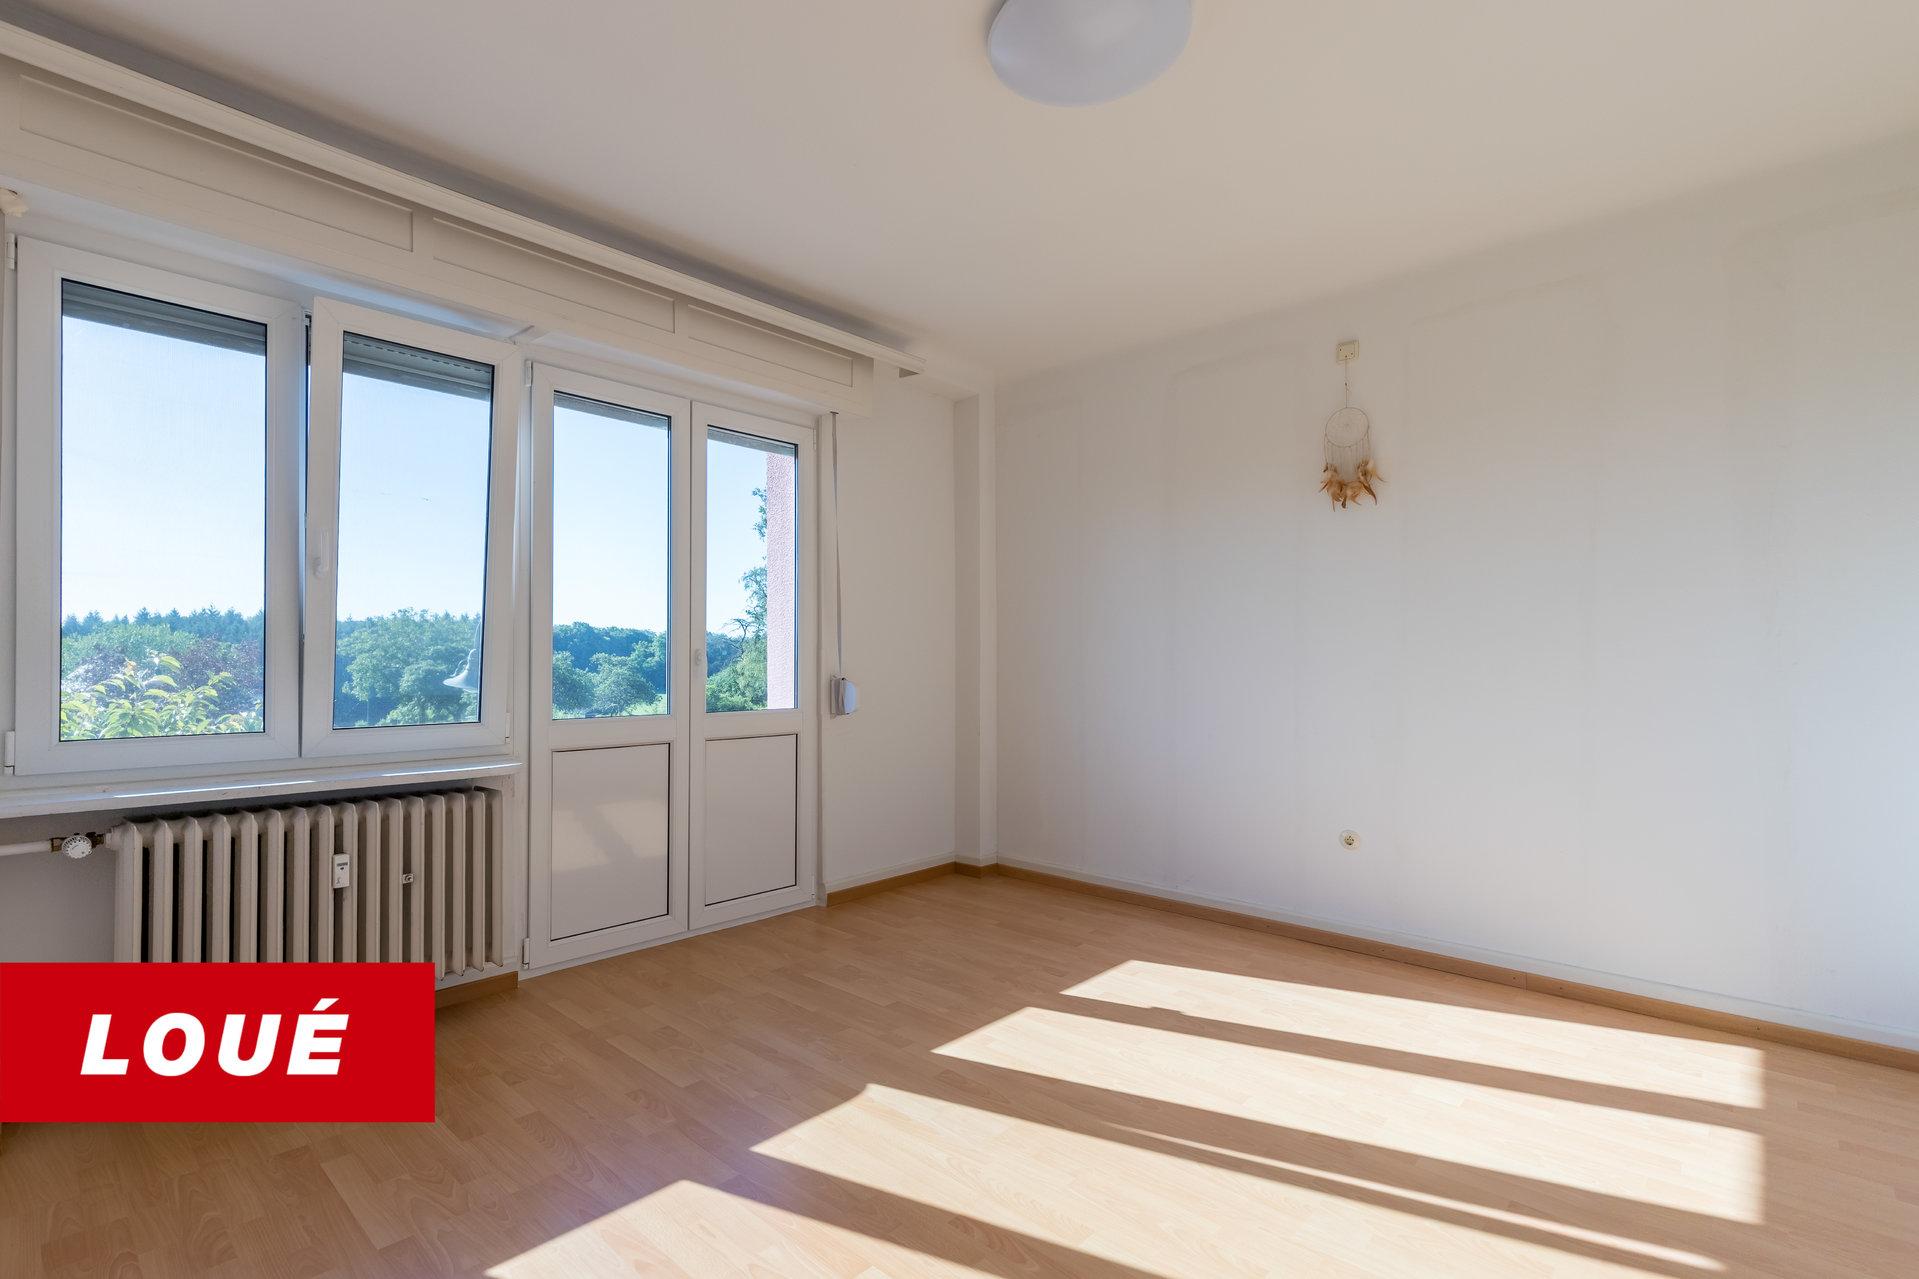 RENTED - appartment/duplex 2 bedrooms in Consdorf